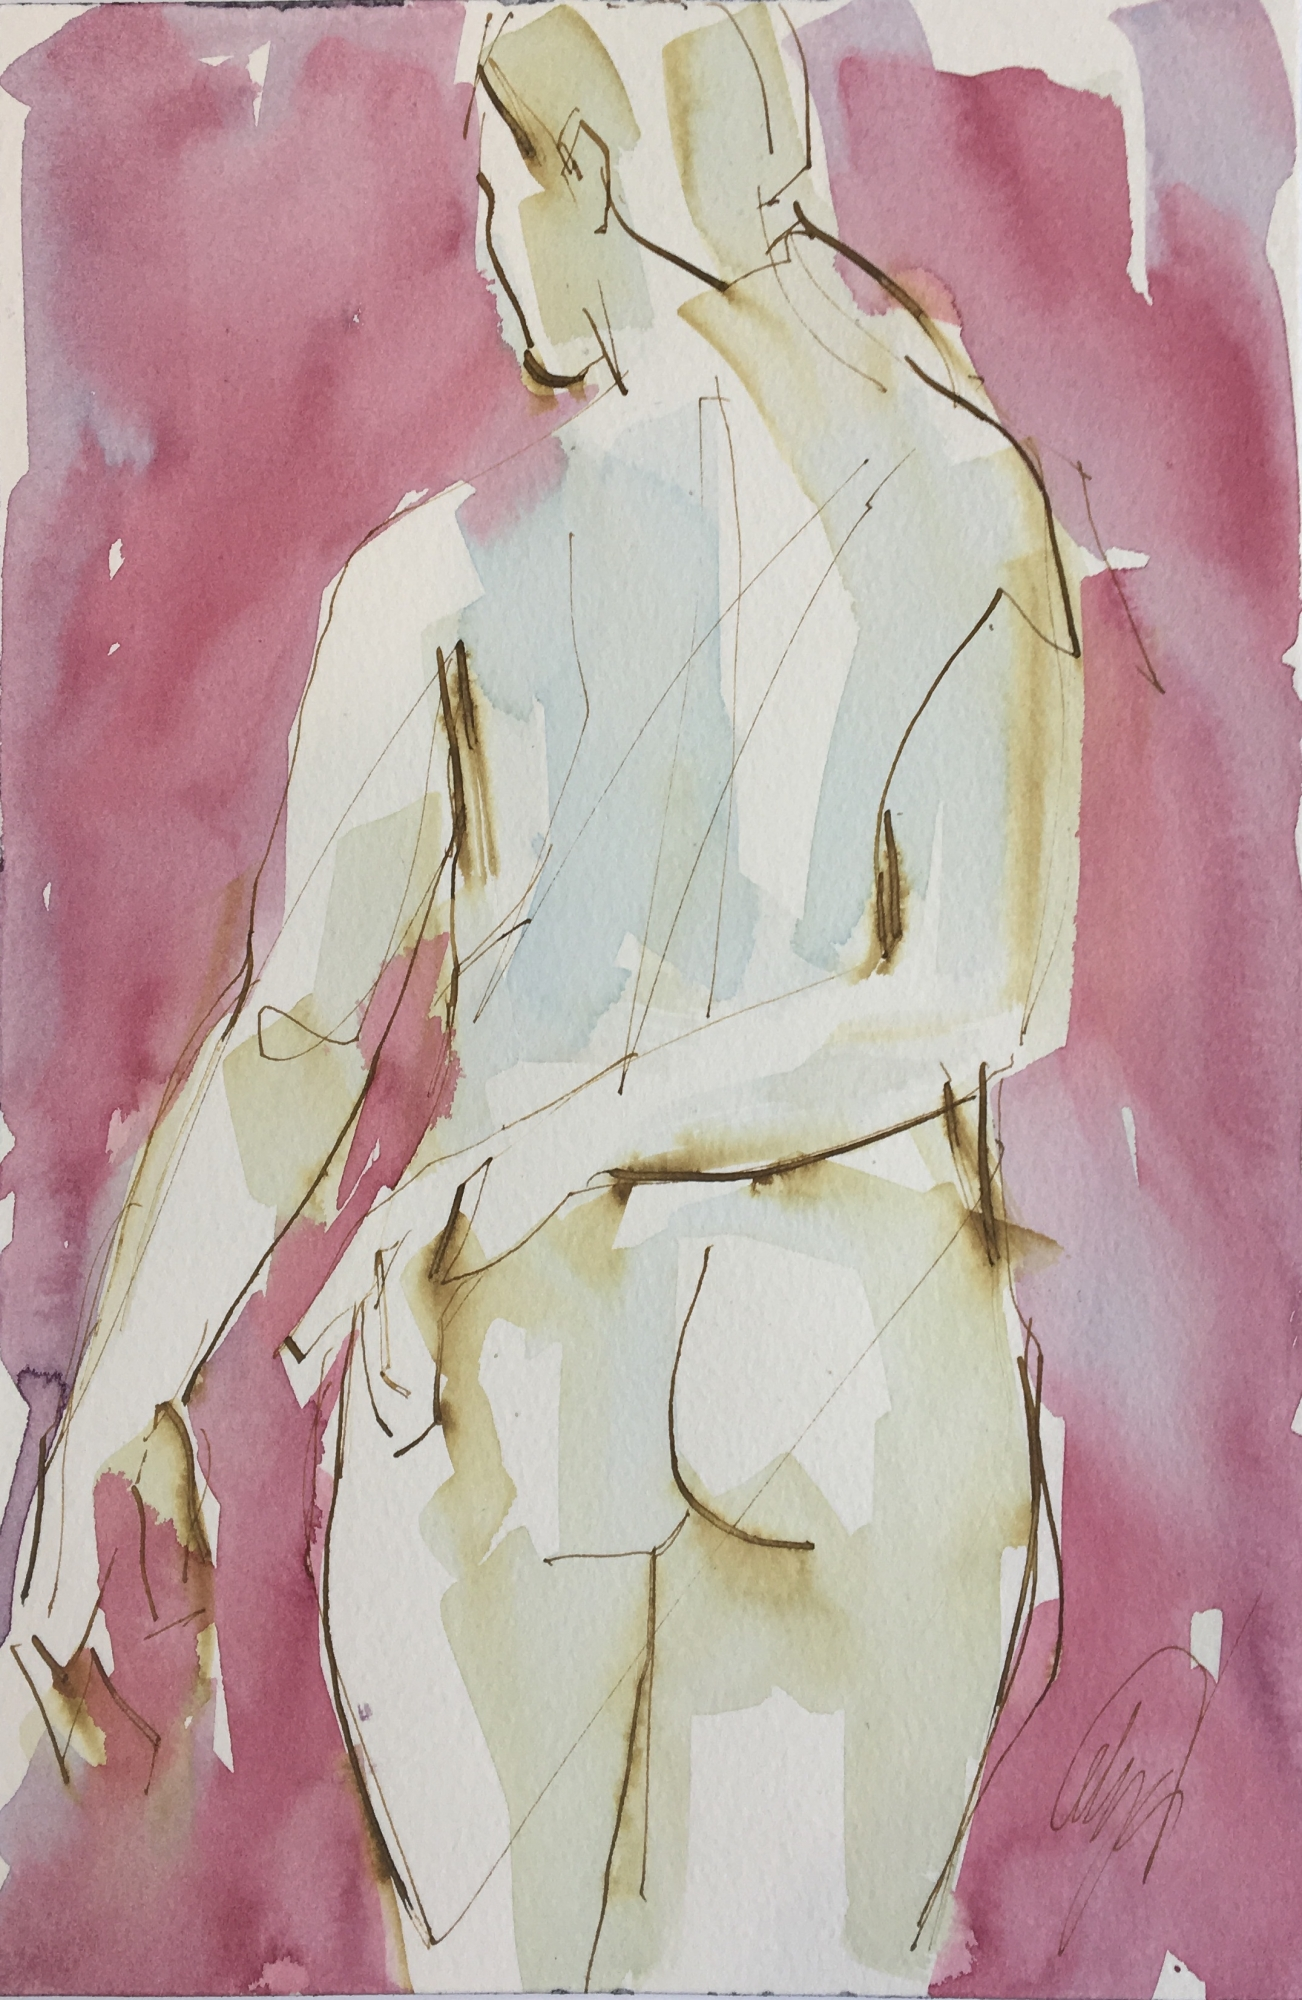 Nude Left Hand on Back  by Mel Delija